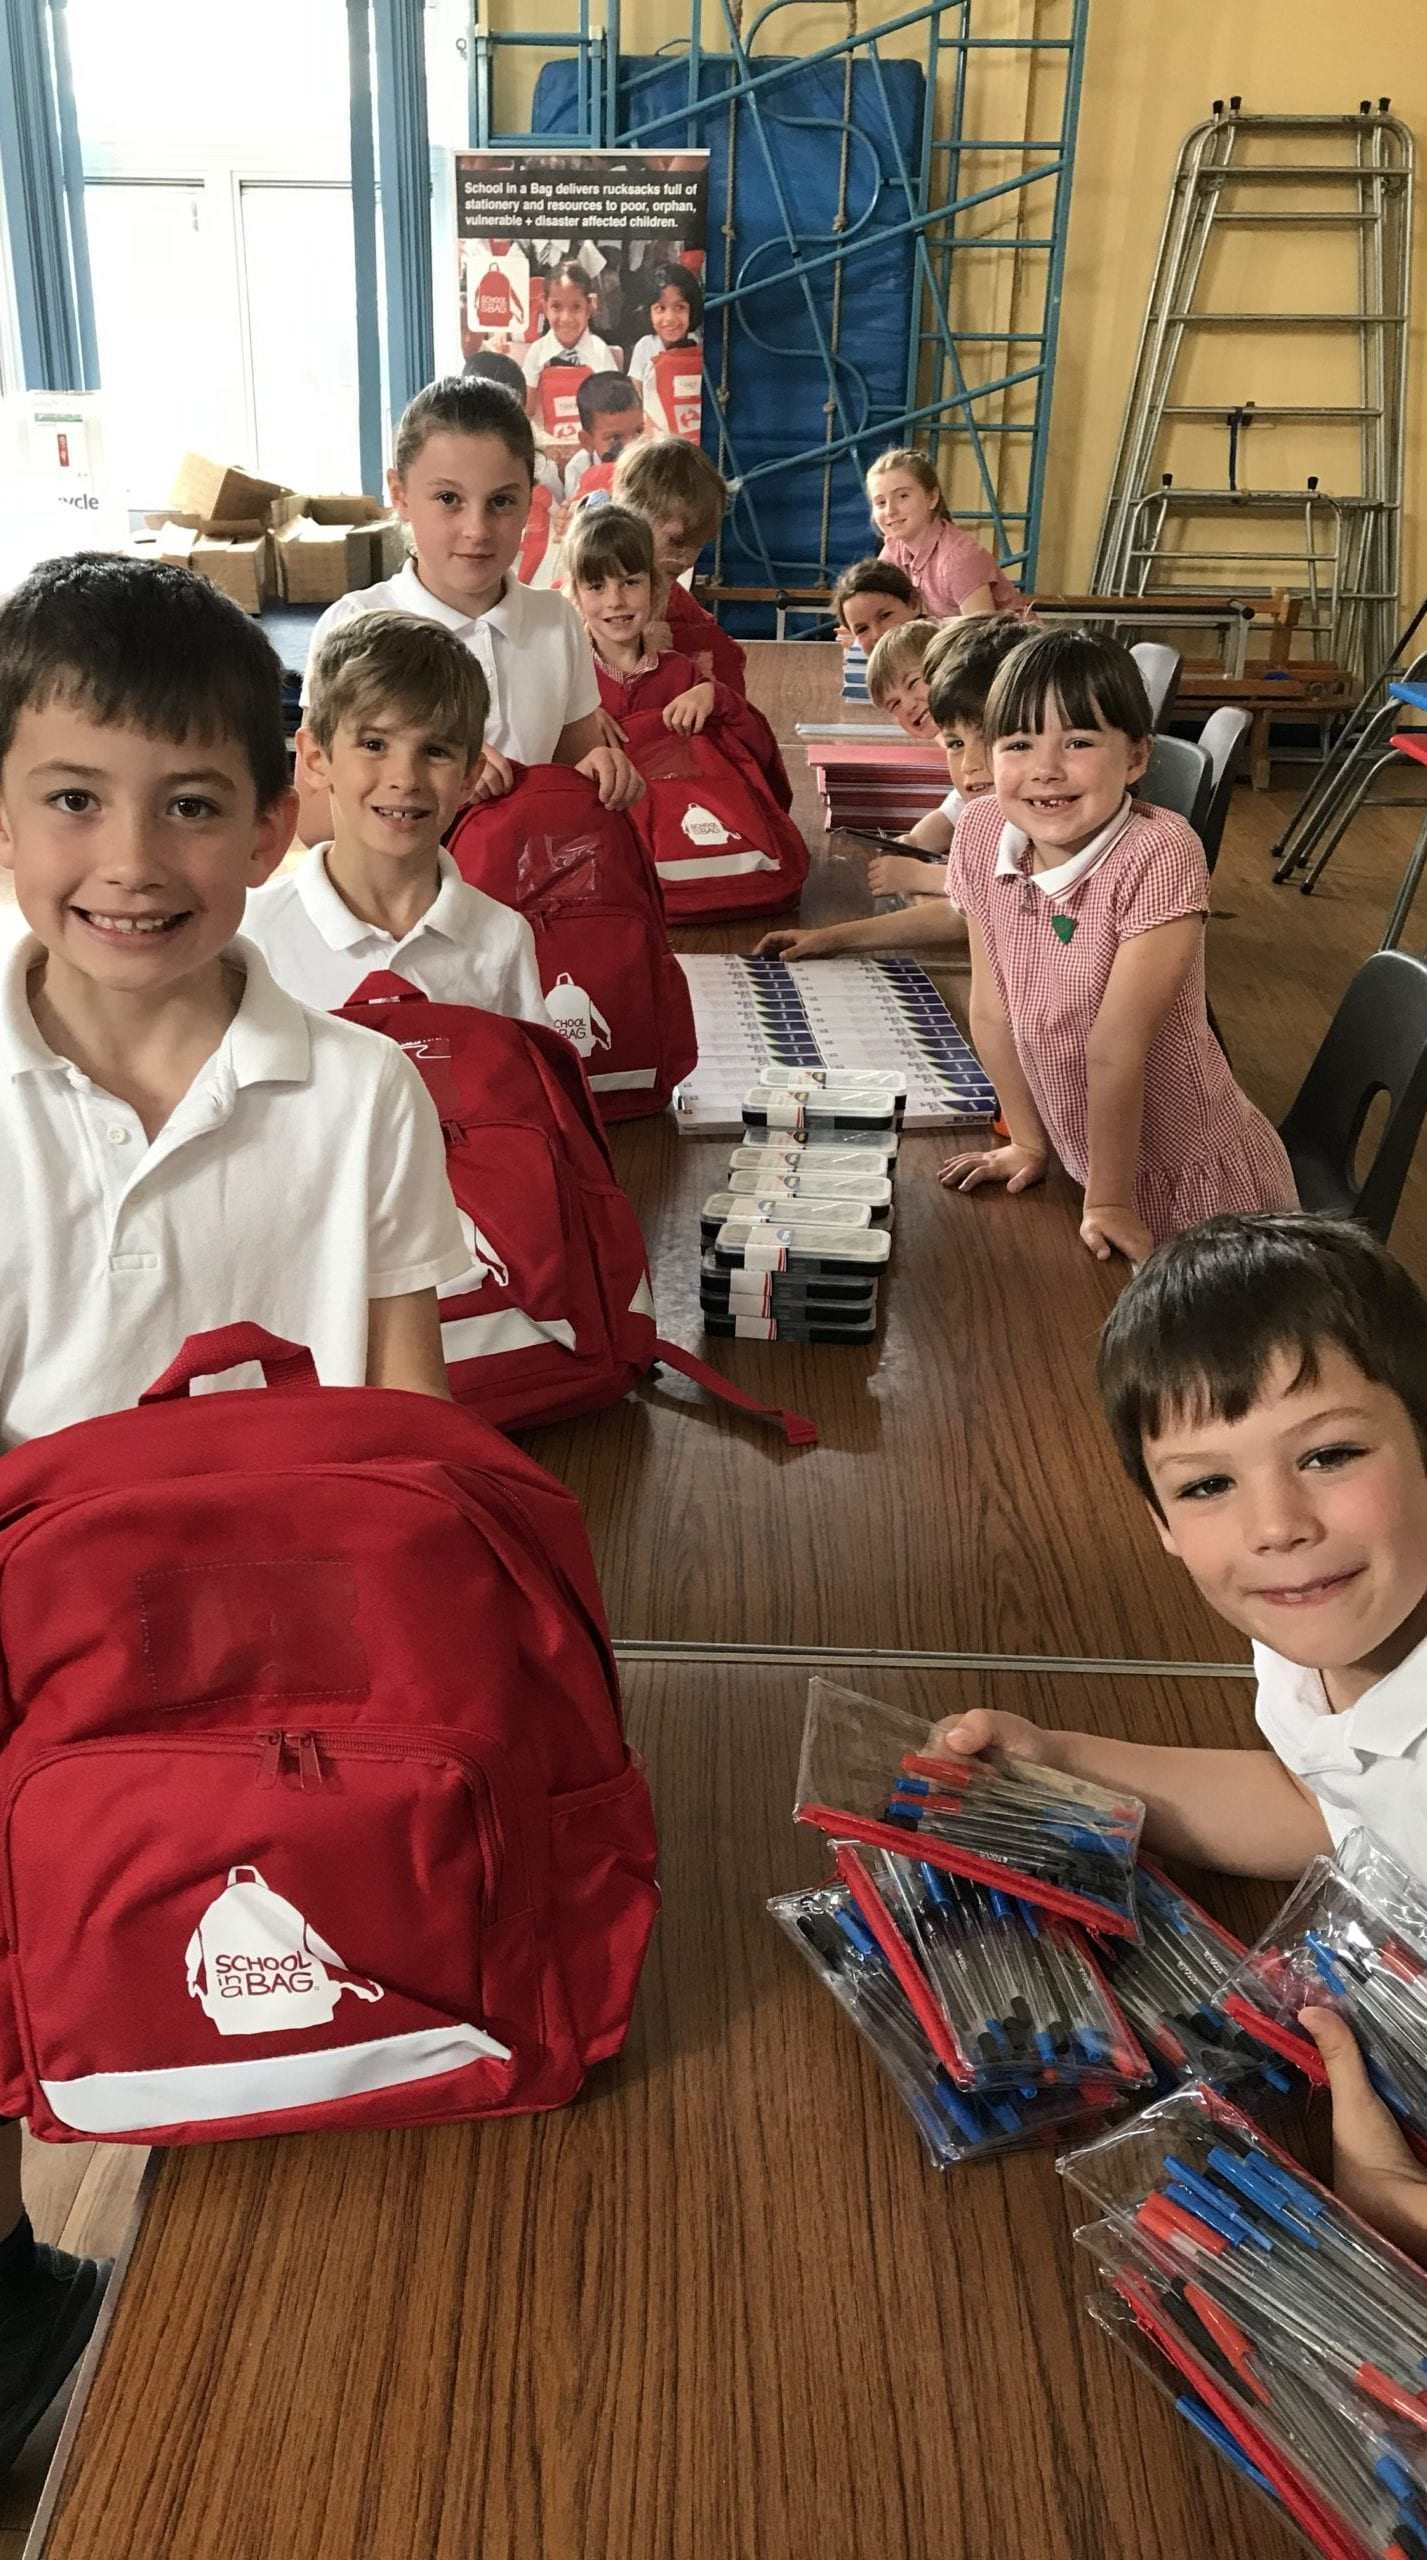 Children Packing SchoolBags